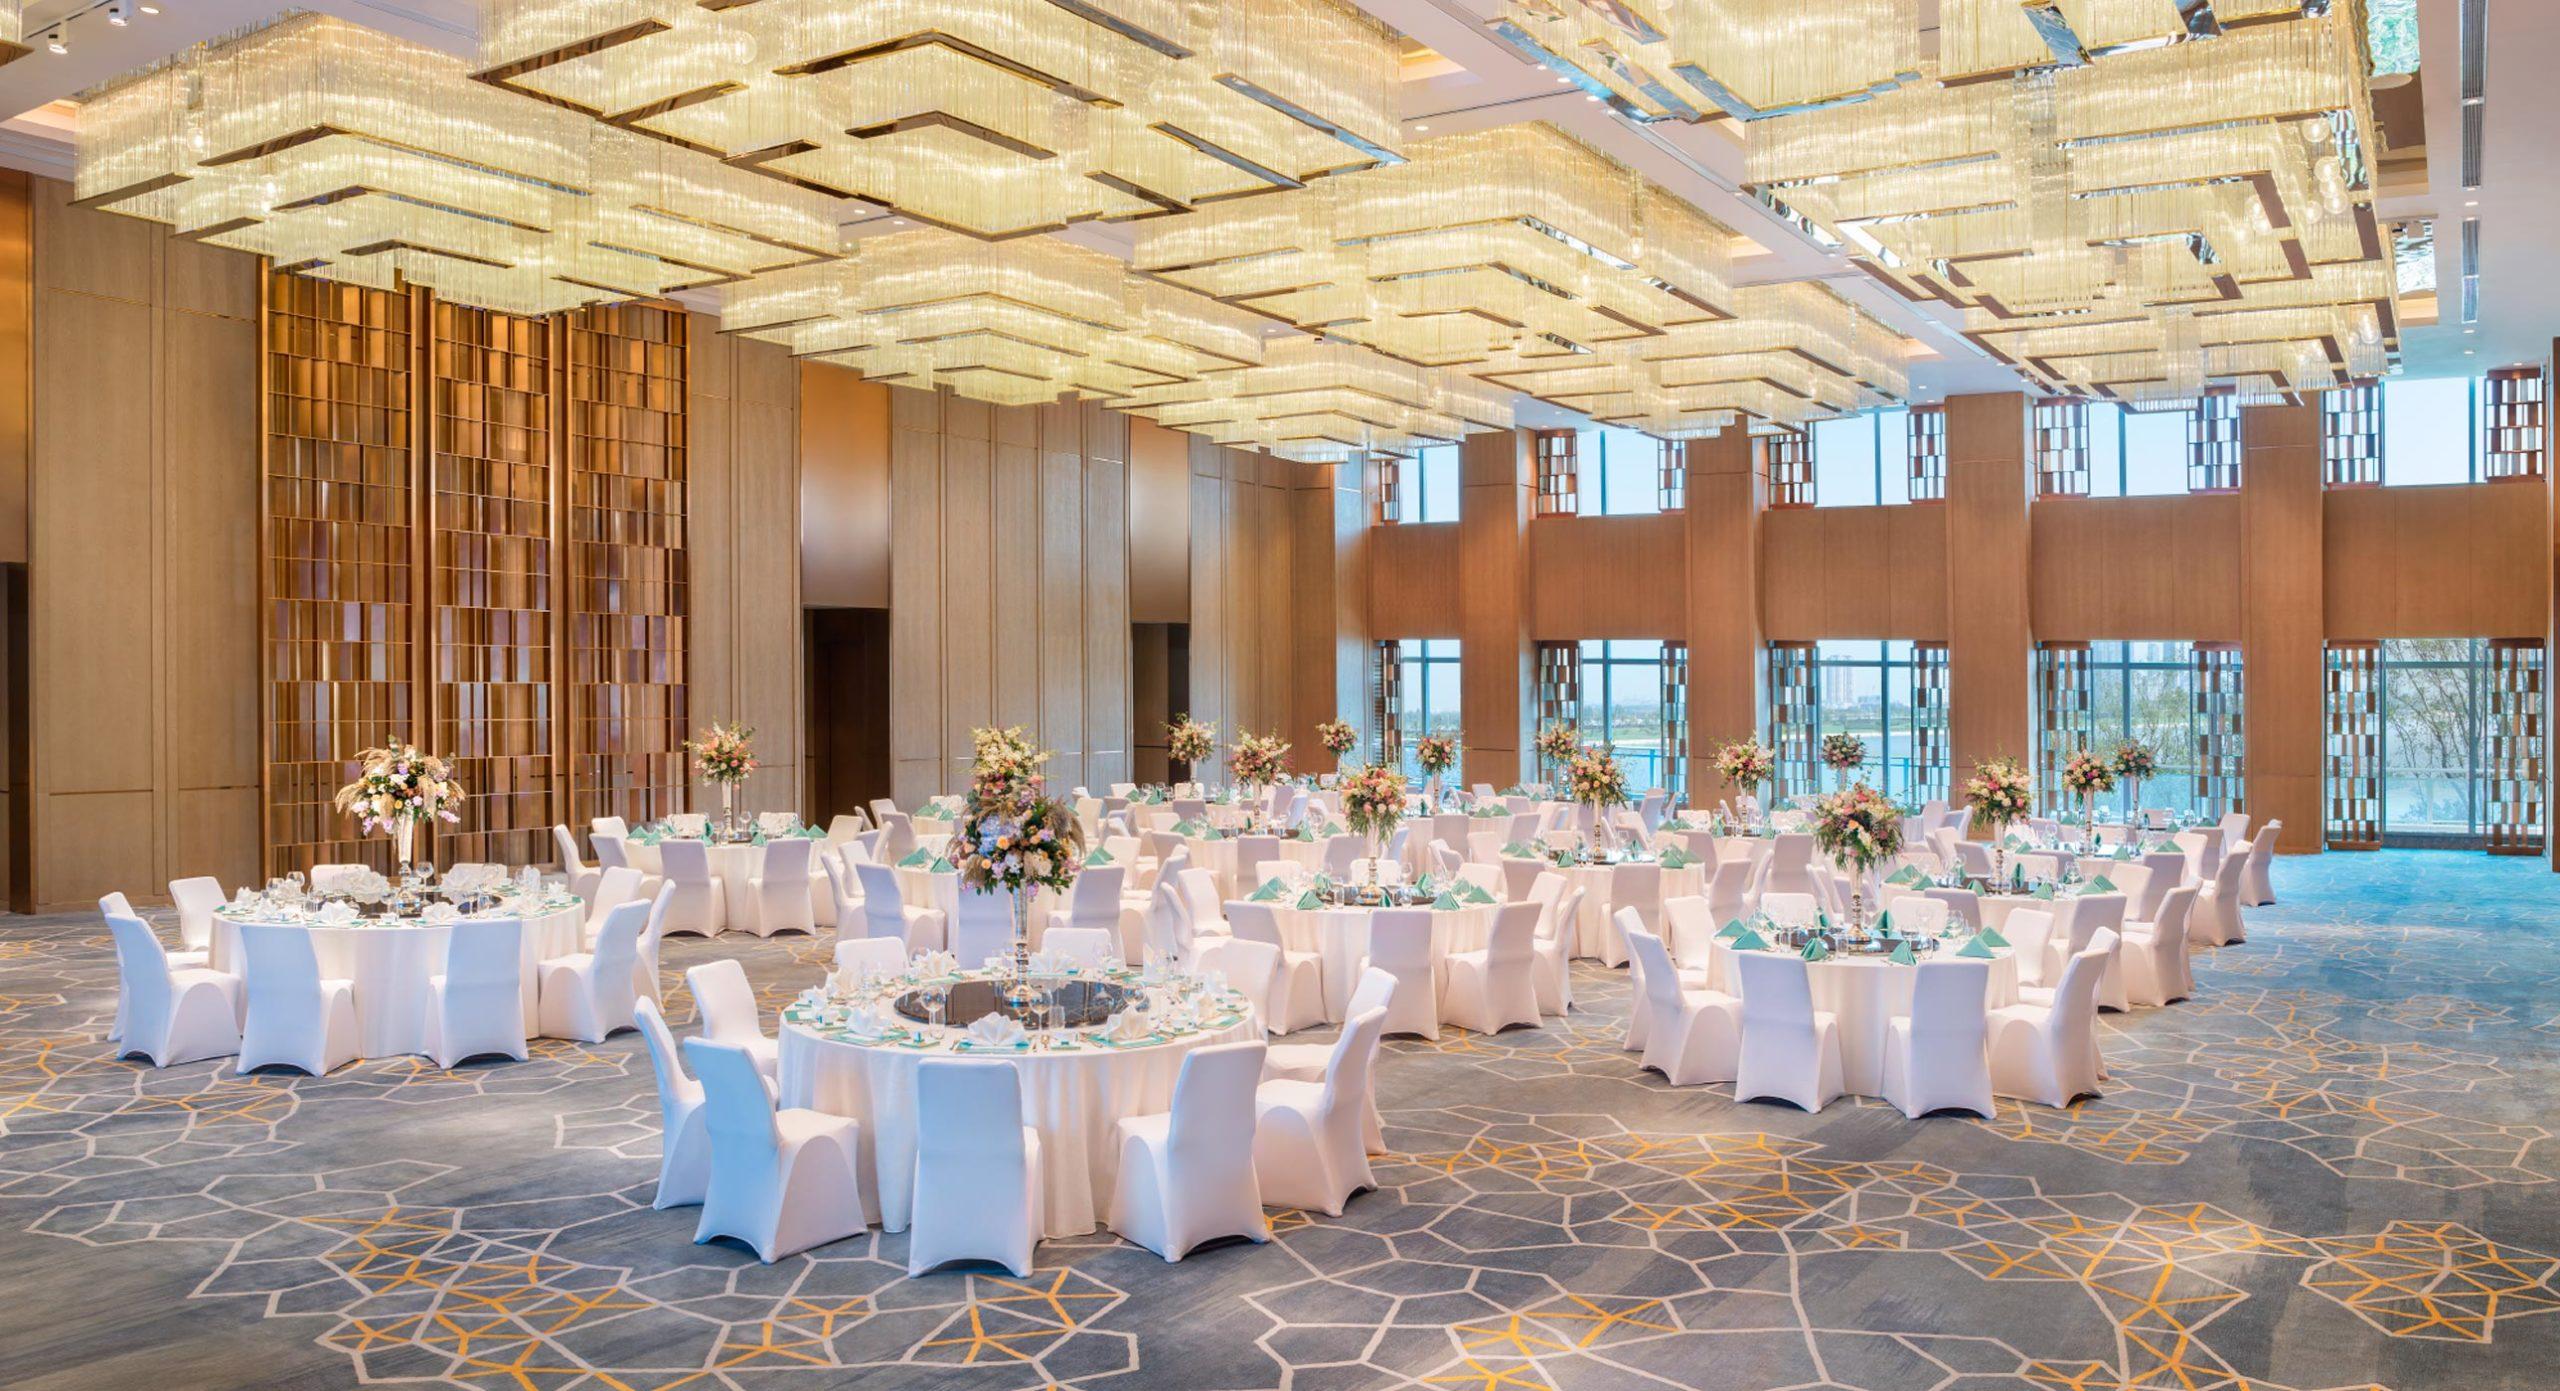 MER_XIYMD_Ballroom_Wedding_02